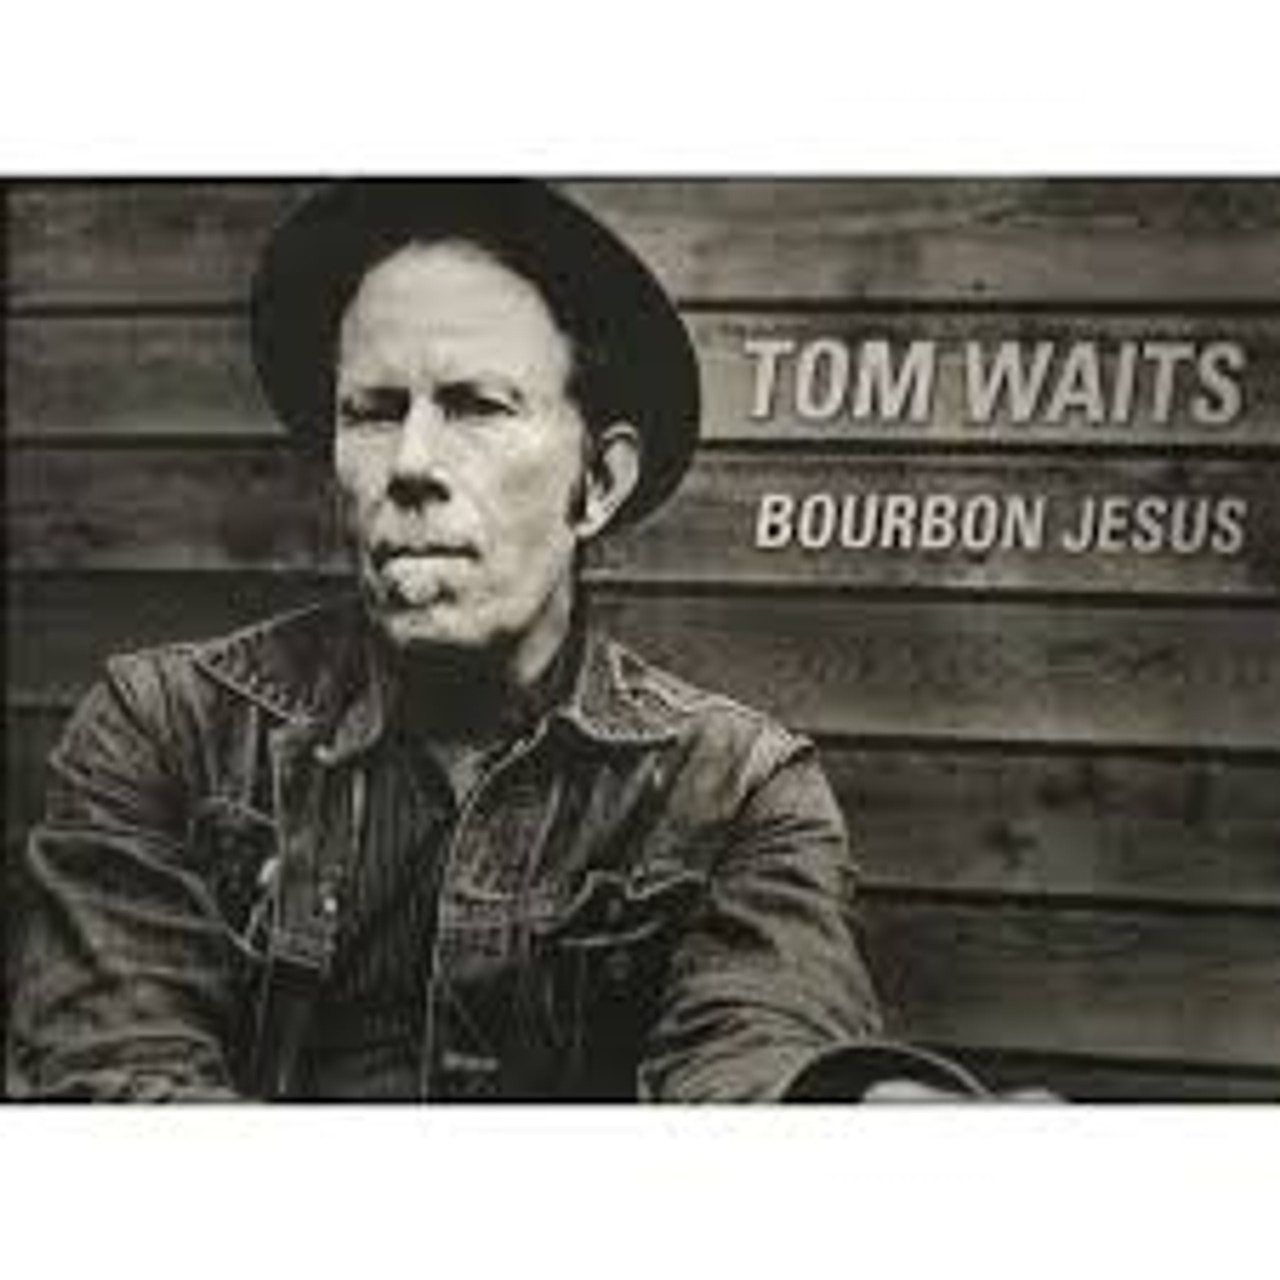 Tom Waits Bourbon Jesus Sealed Vinyl Lp 1999 Italia